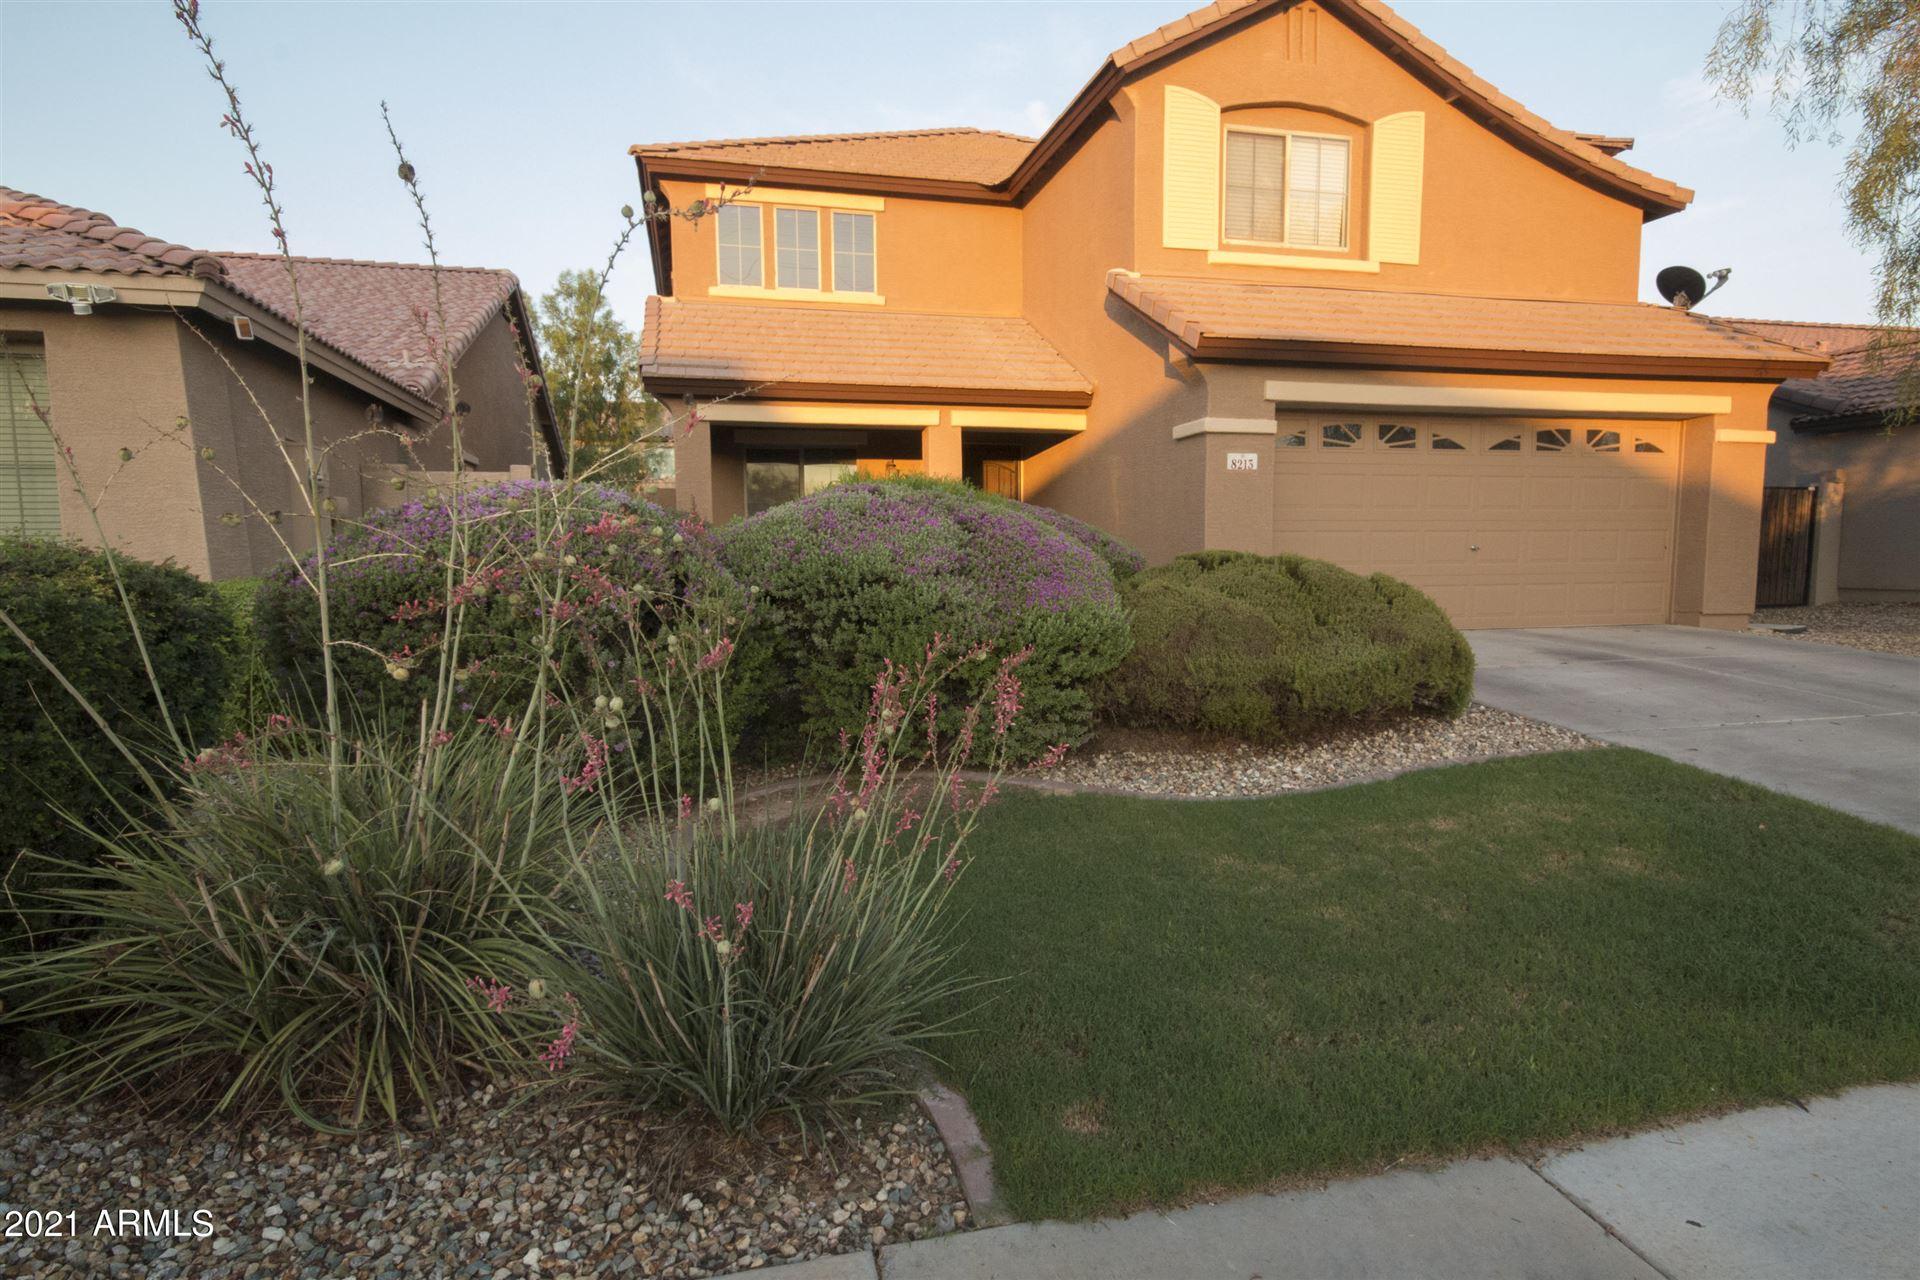 Photo of 8213 S 48TH Lane, Laveen, AZ 85339 (MLS # 6272530)